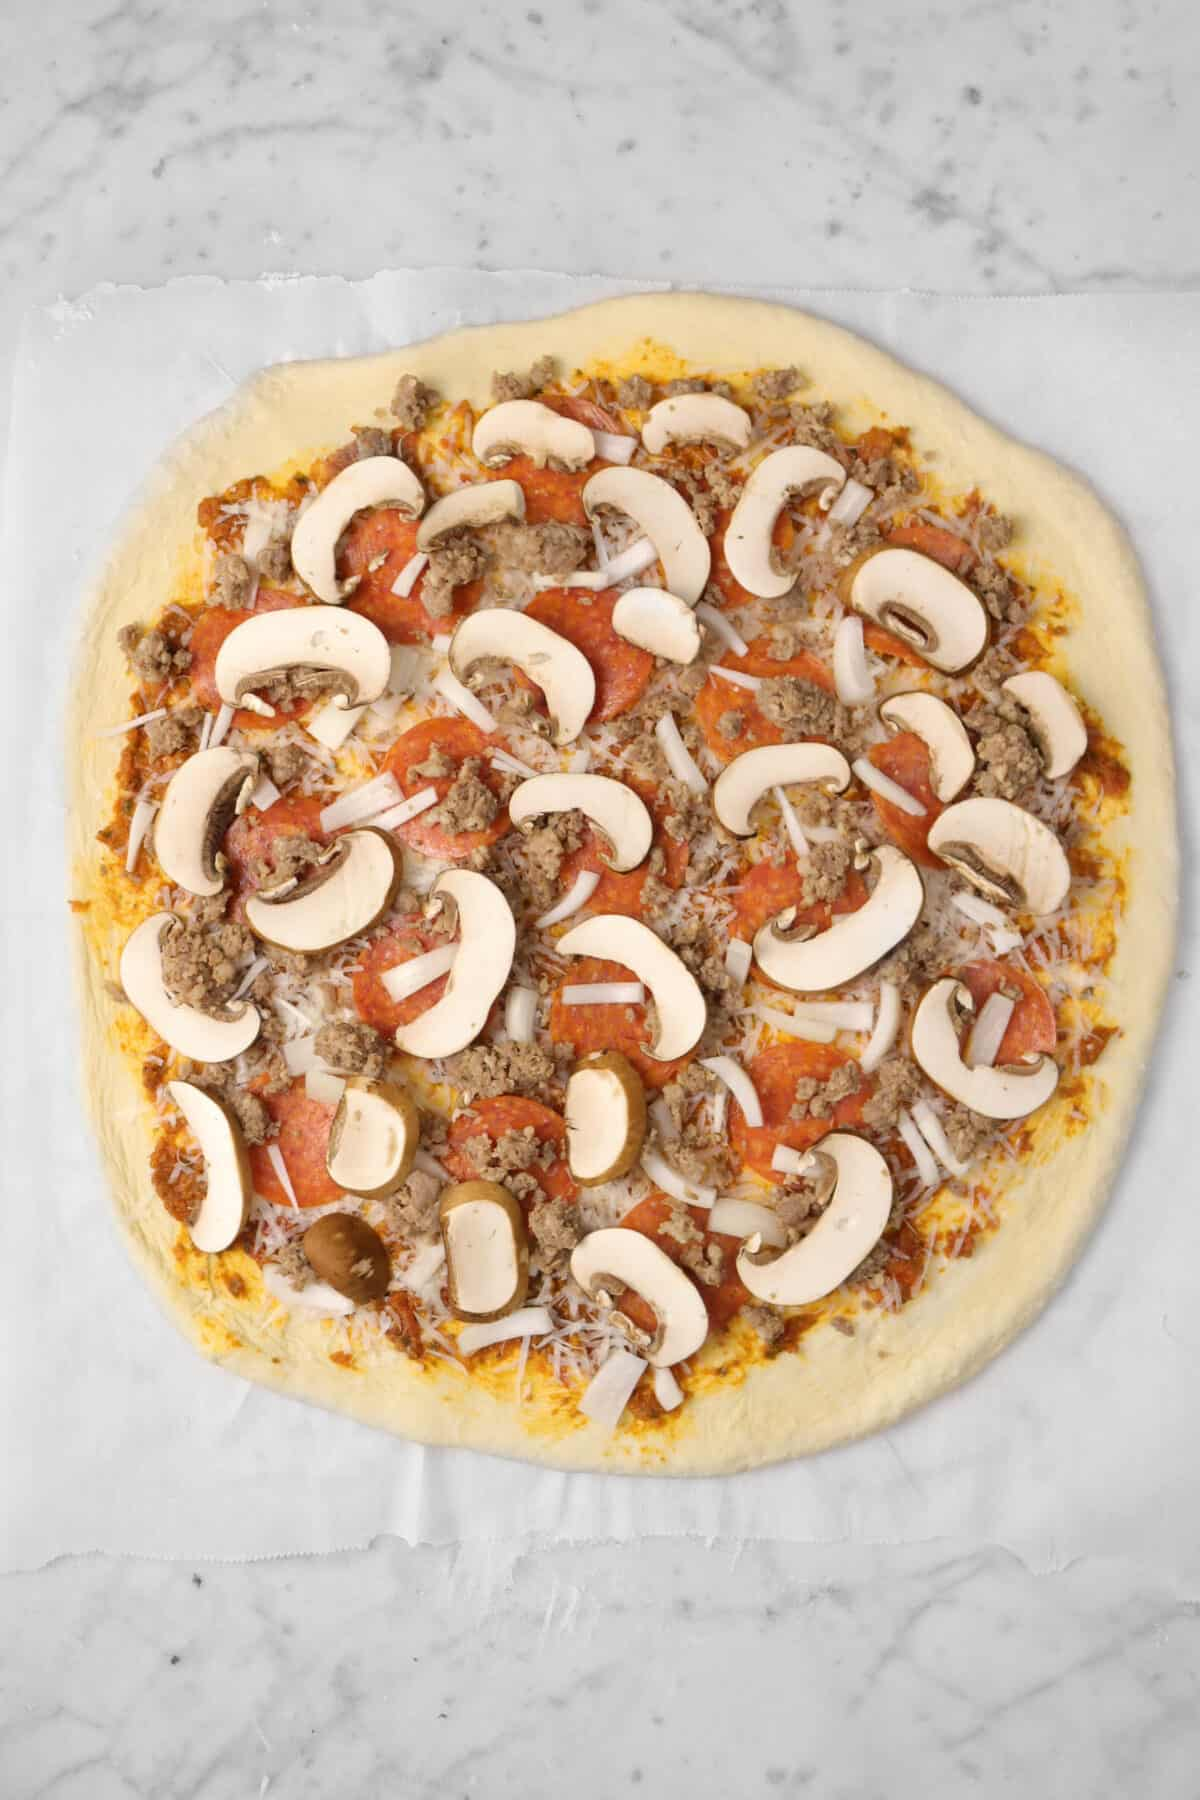 sliced mushrooms added on top of pizza